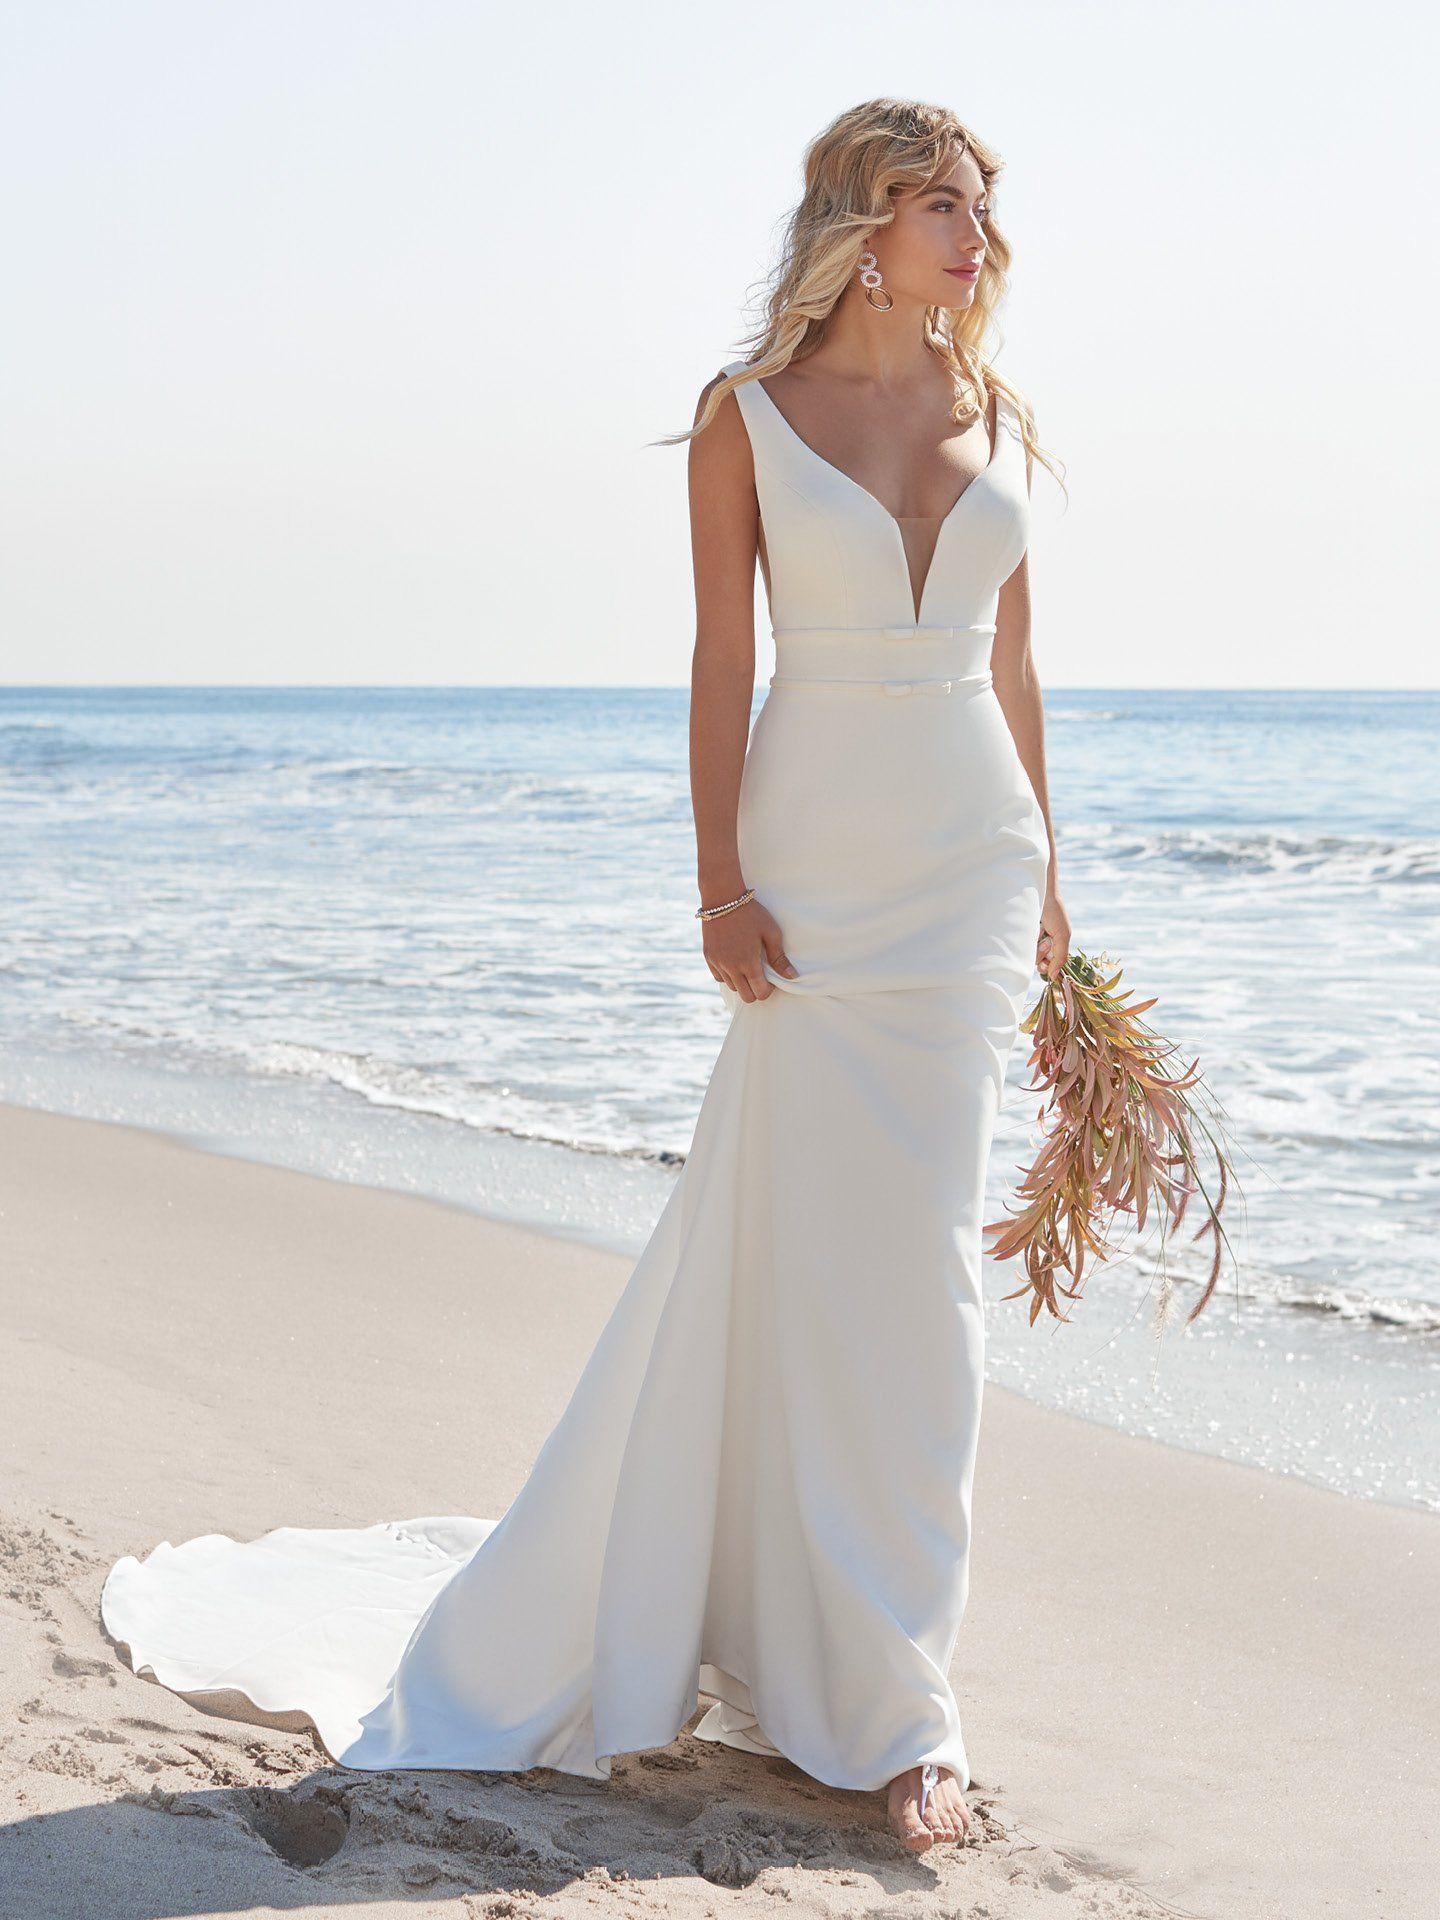 Danica By Rebecca Ingram Wedding Dresses And Accessories Crepe Wedding Dress Bridal Elegance Wedding Dresses [ 1920 x 1440 Pixel ]